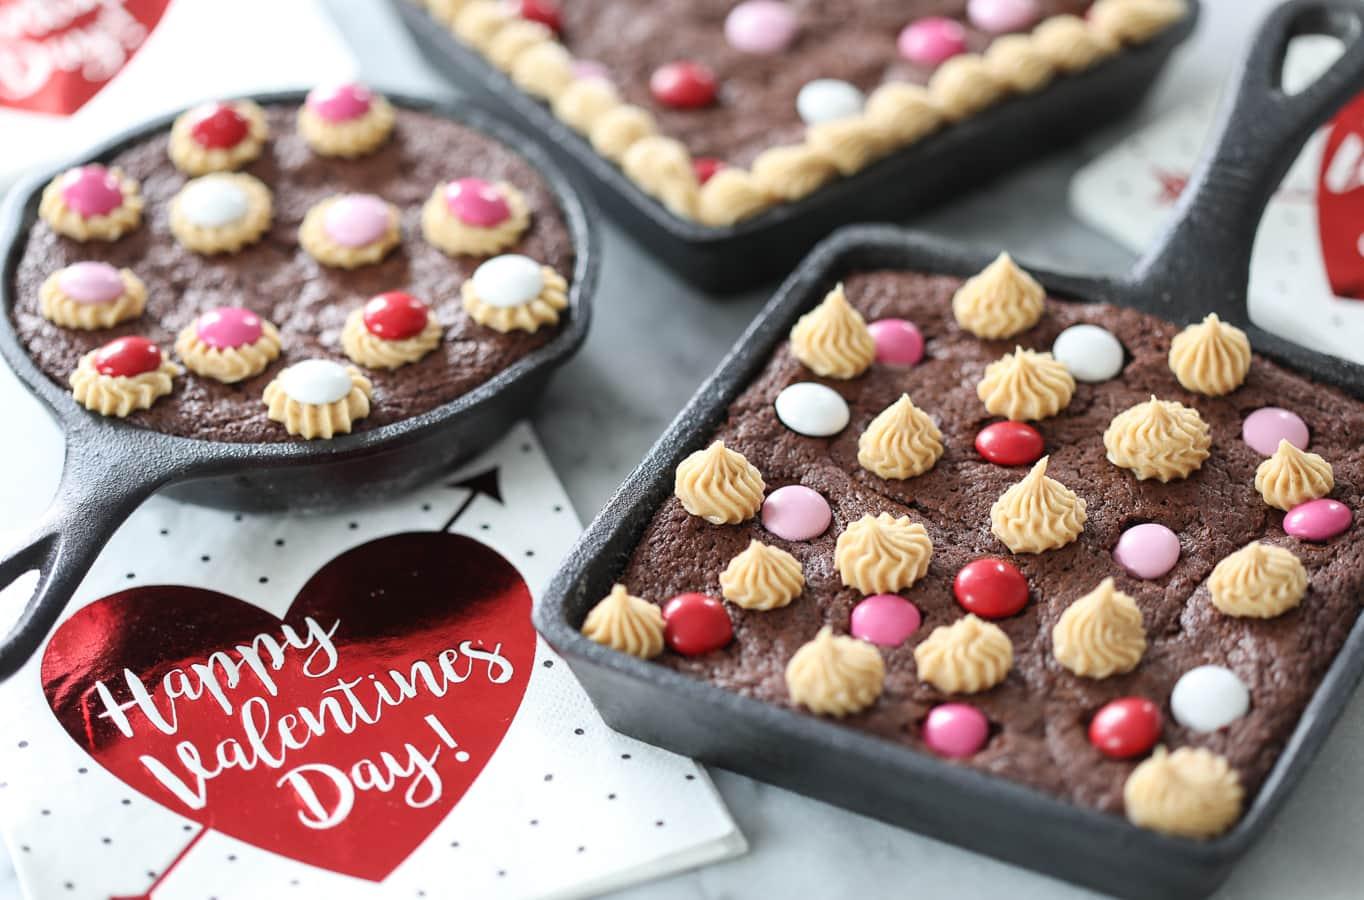 Homemade Skillet Brownies - dessert recipe for Valentine's Day!